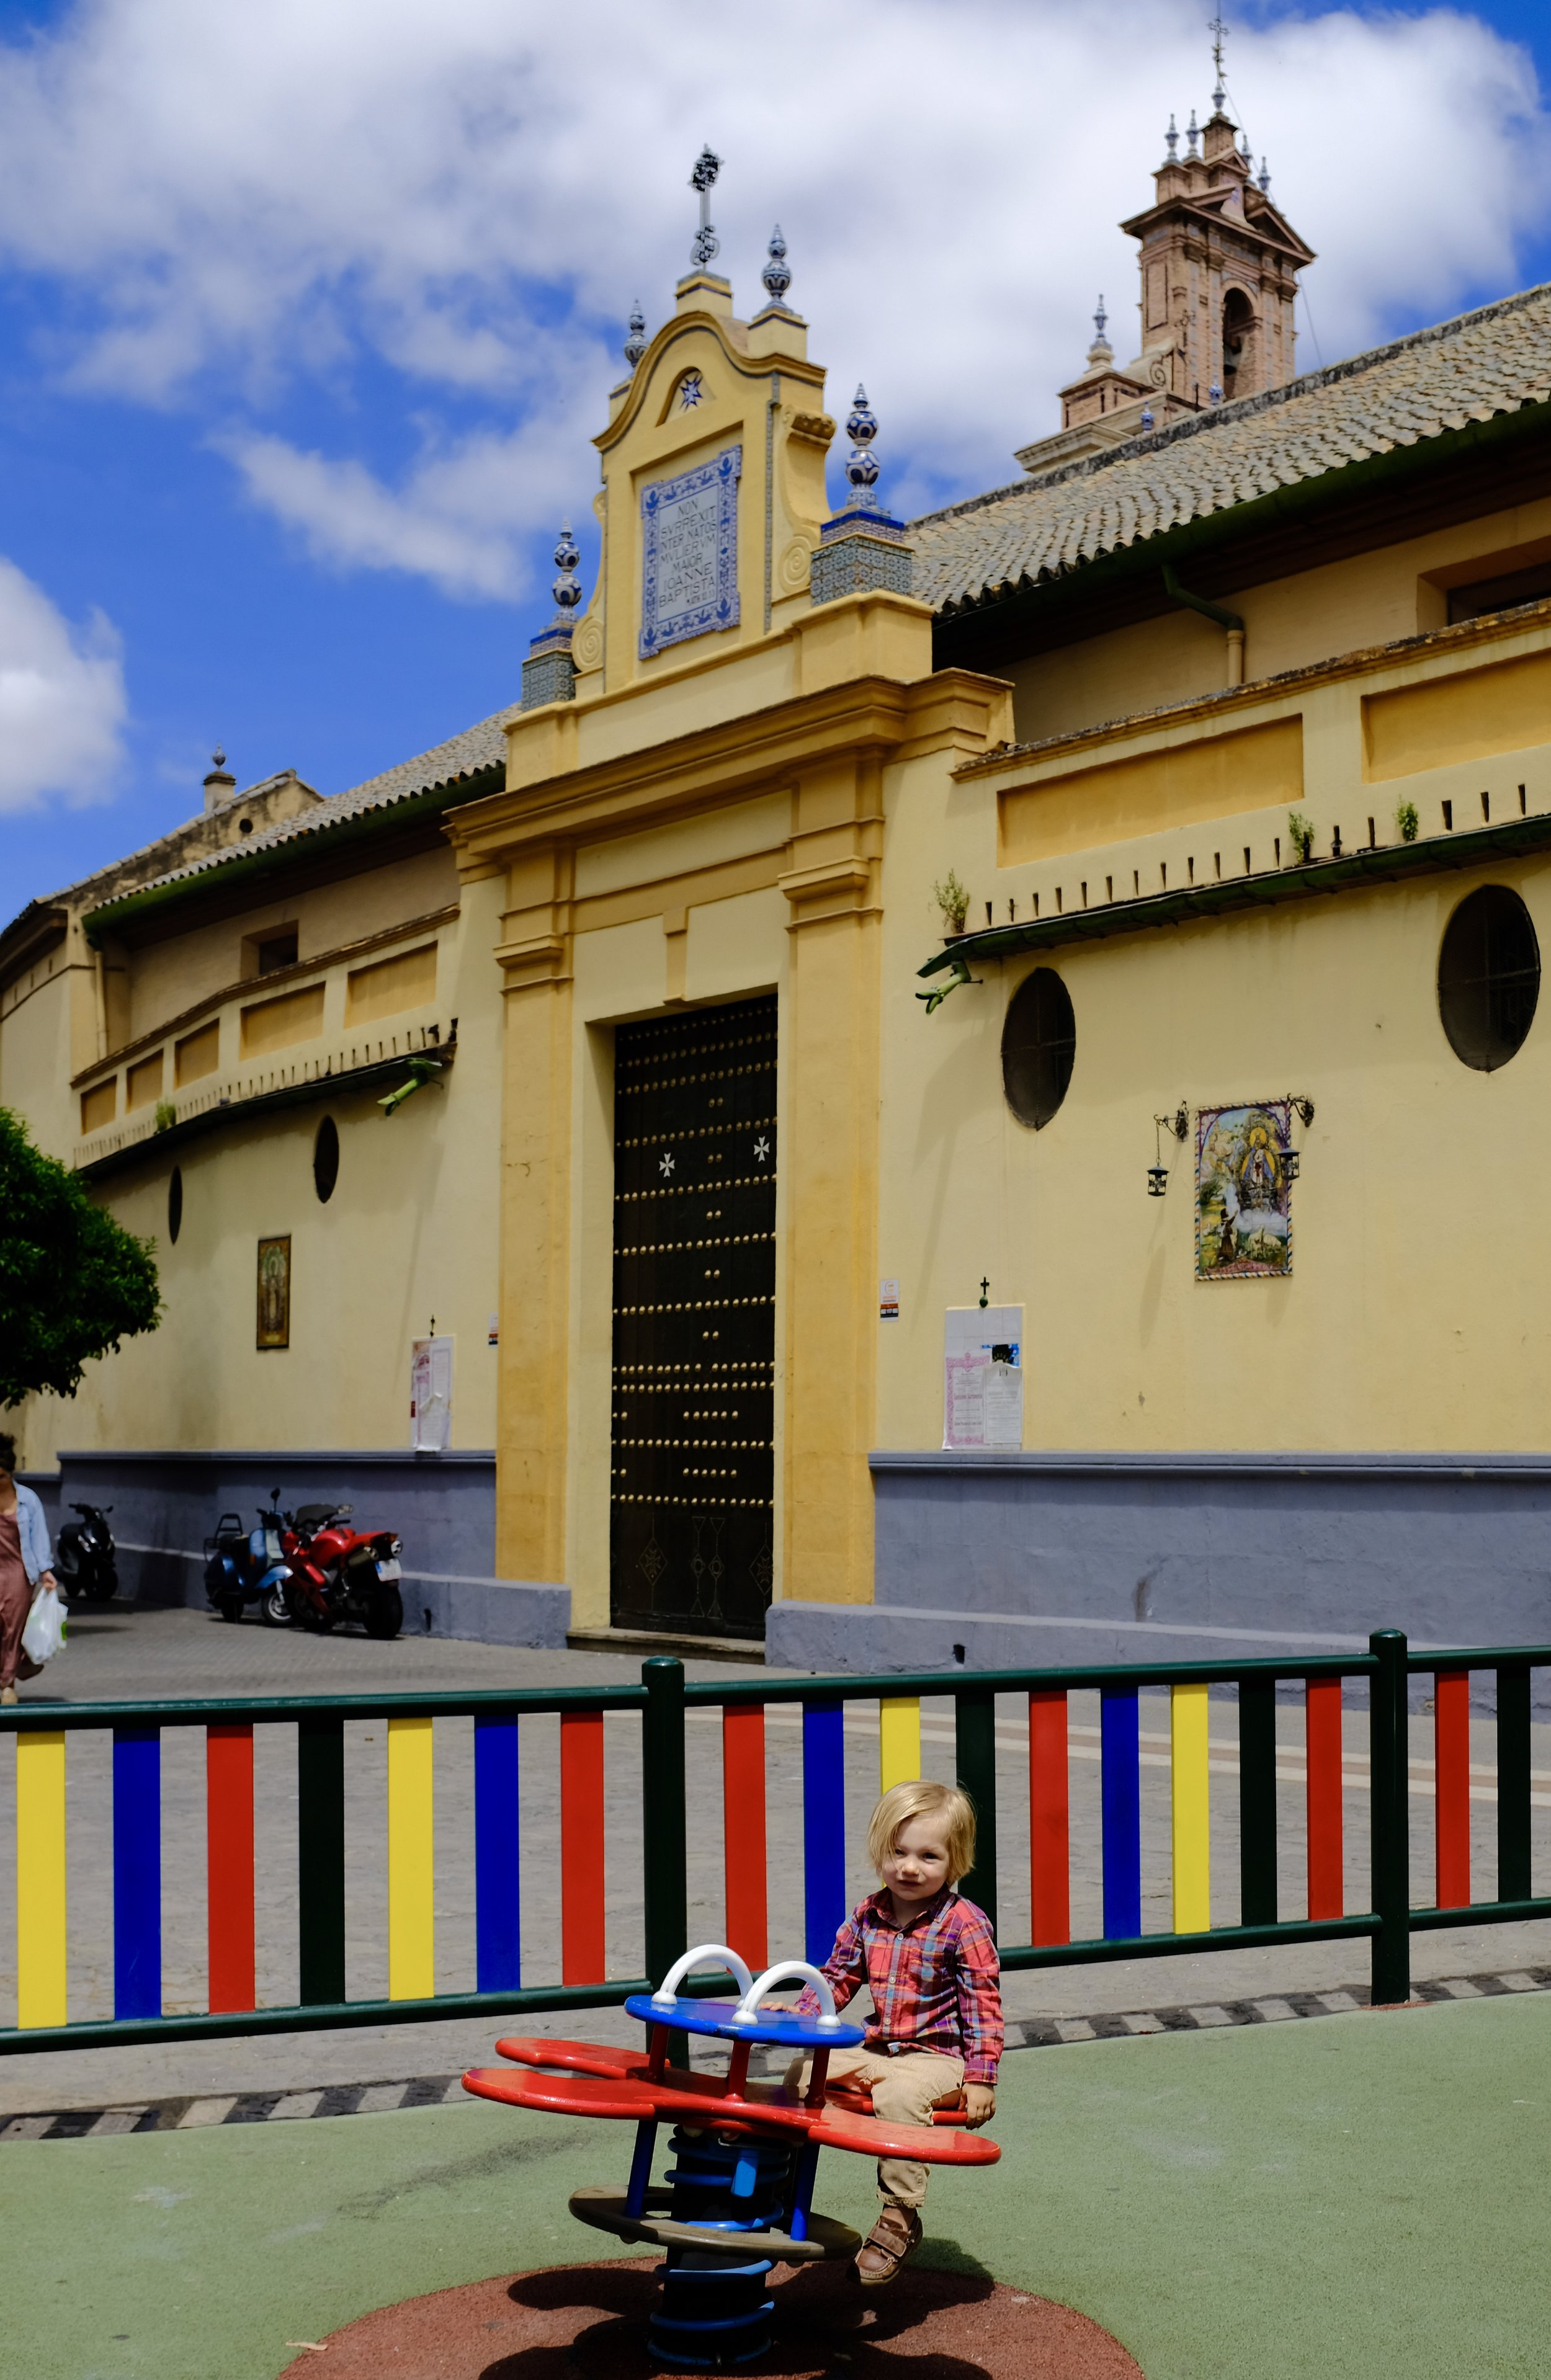 Zona de Juegos Infantiles_City Nibbler_Seville